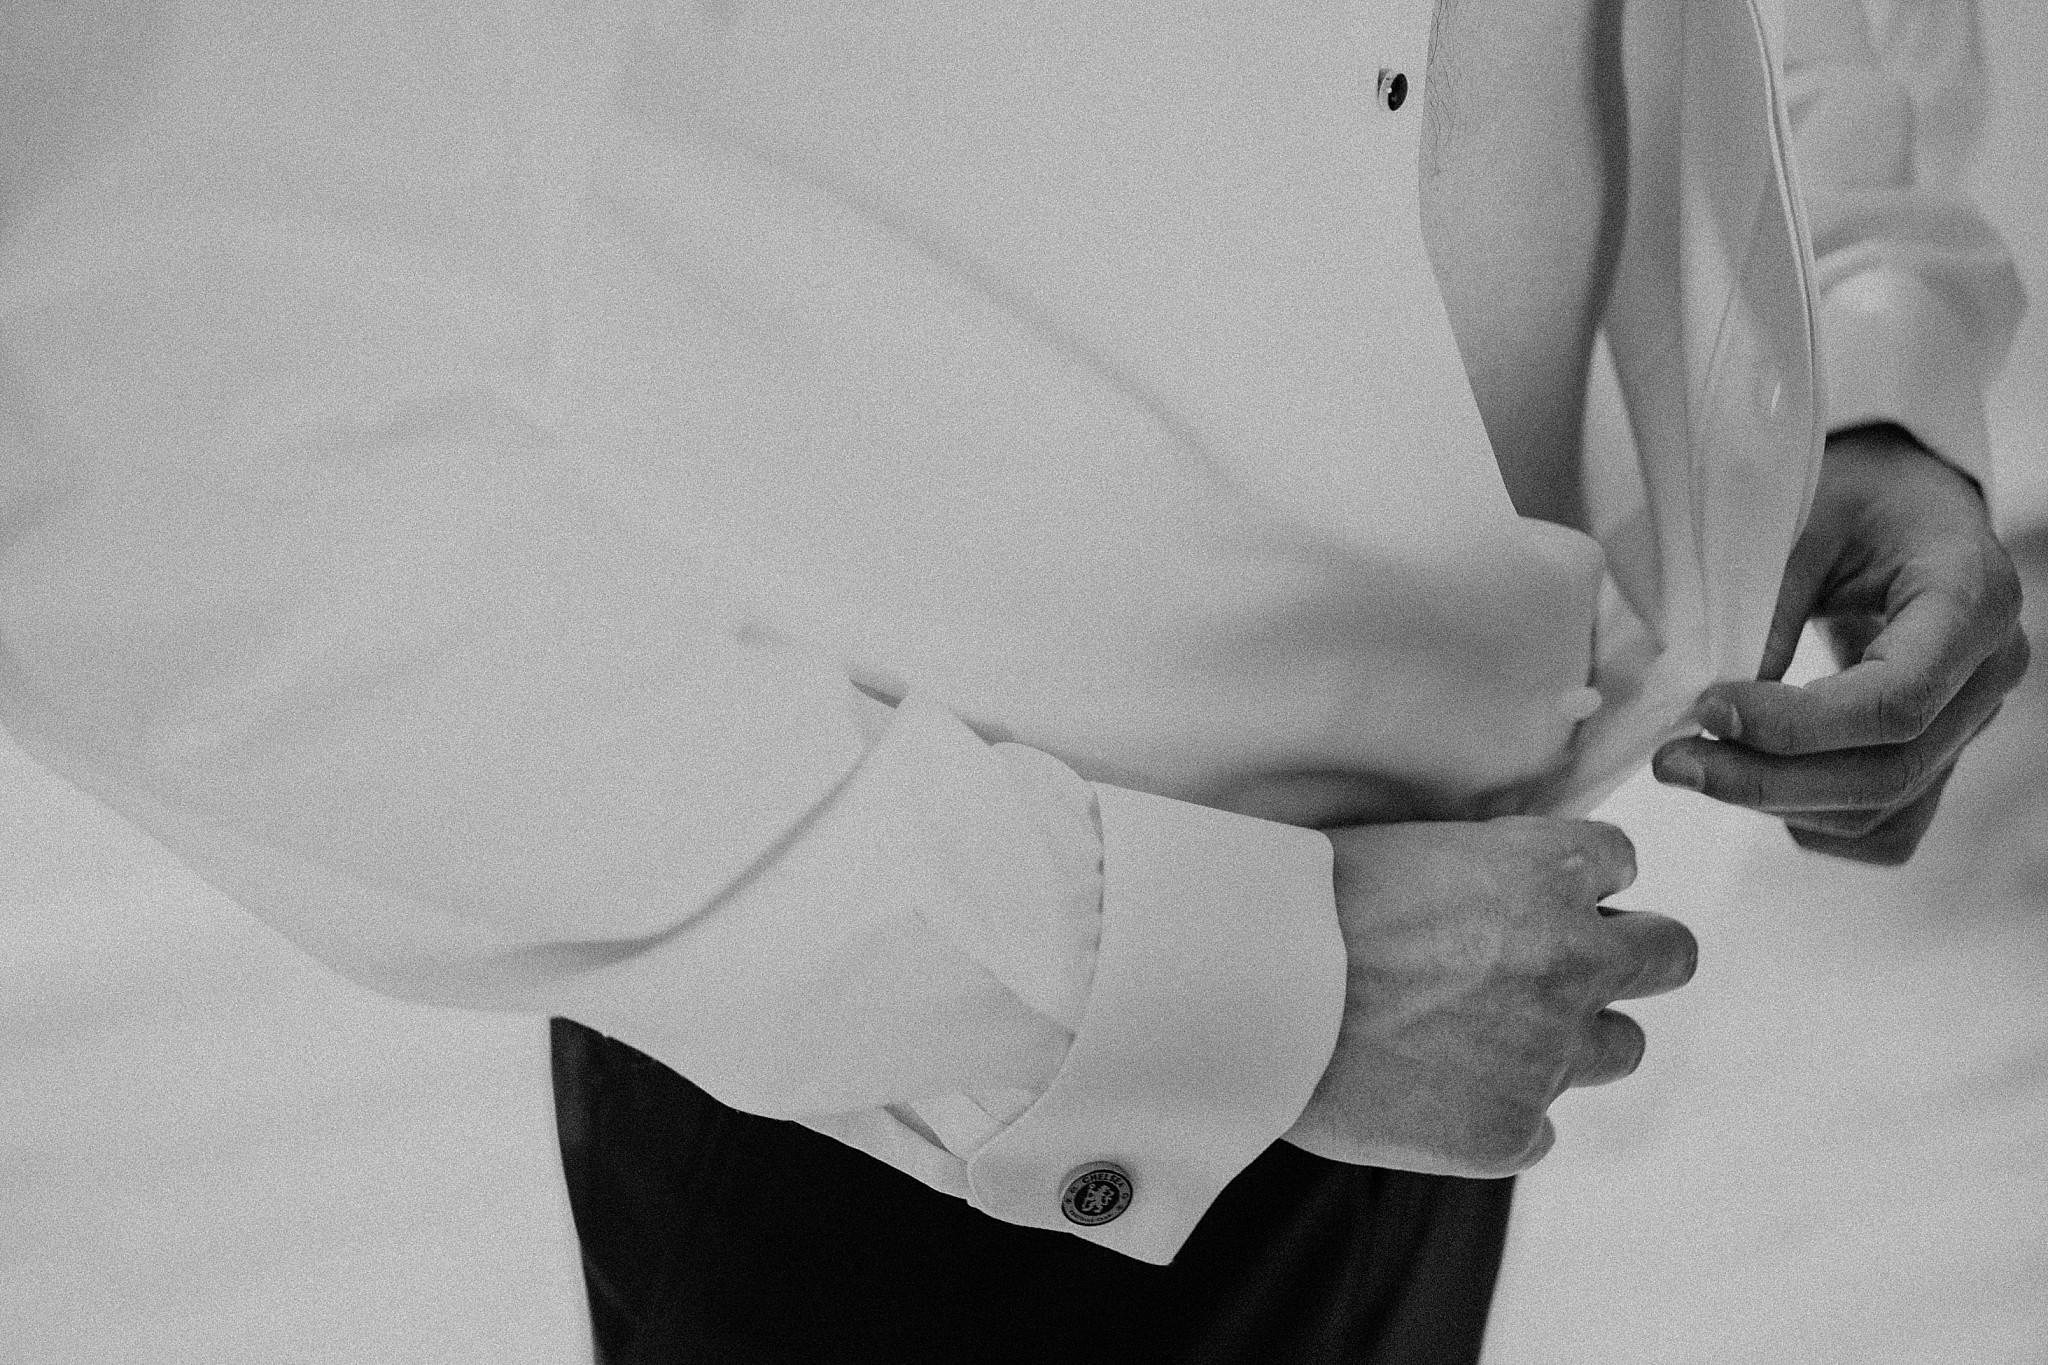 fotograf poznan wesele dobra truskawka piekne wesele pod poznaniem wesele w dobrej truskawce piekna para mloda slub marzen slub koronawirus slub listopad wesele koronawirus 052